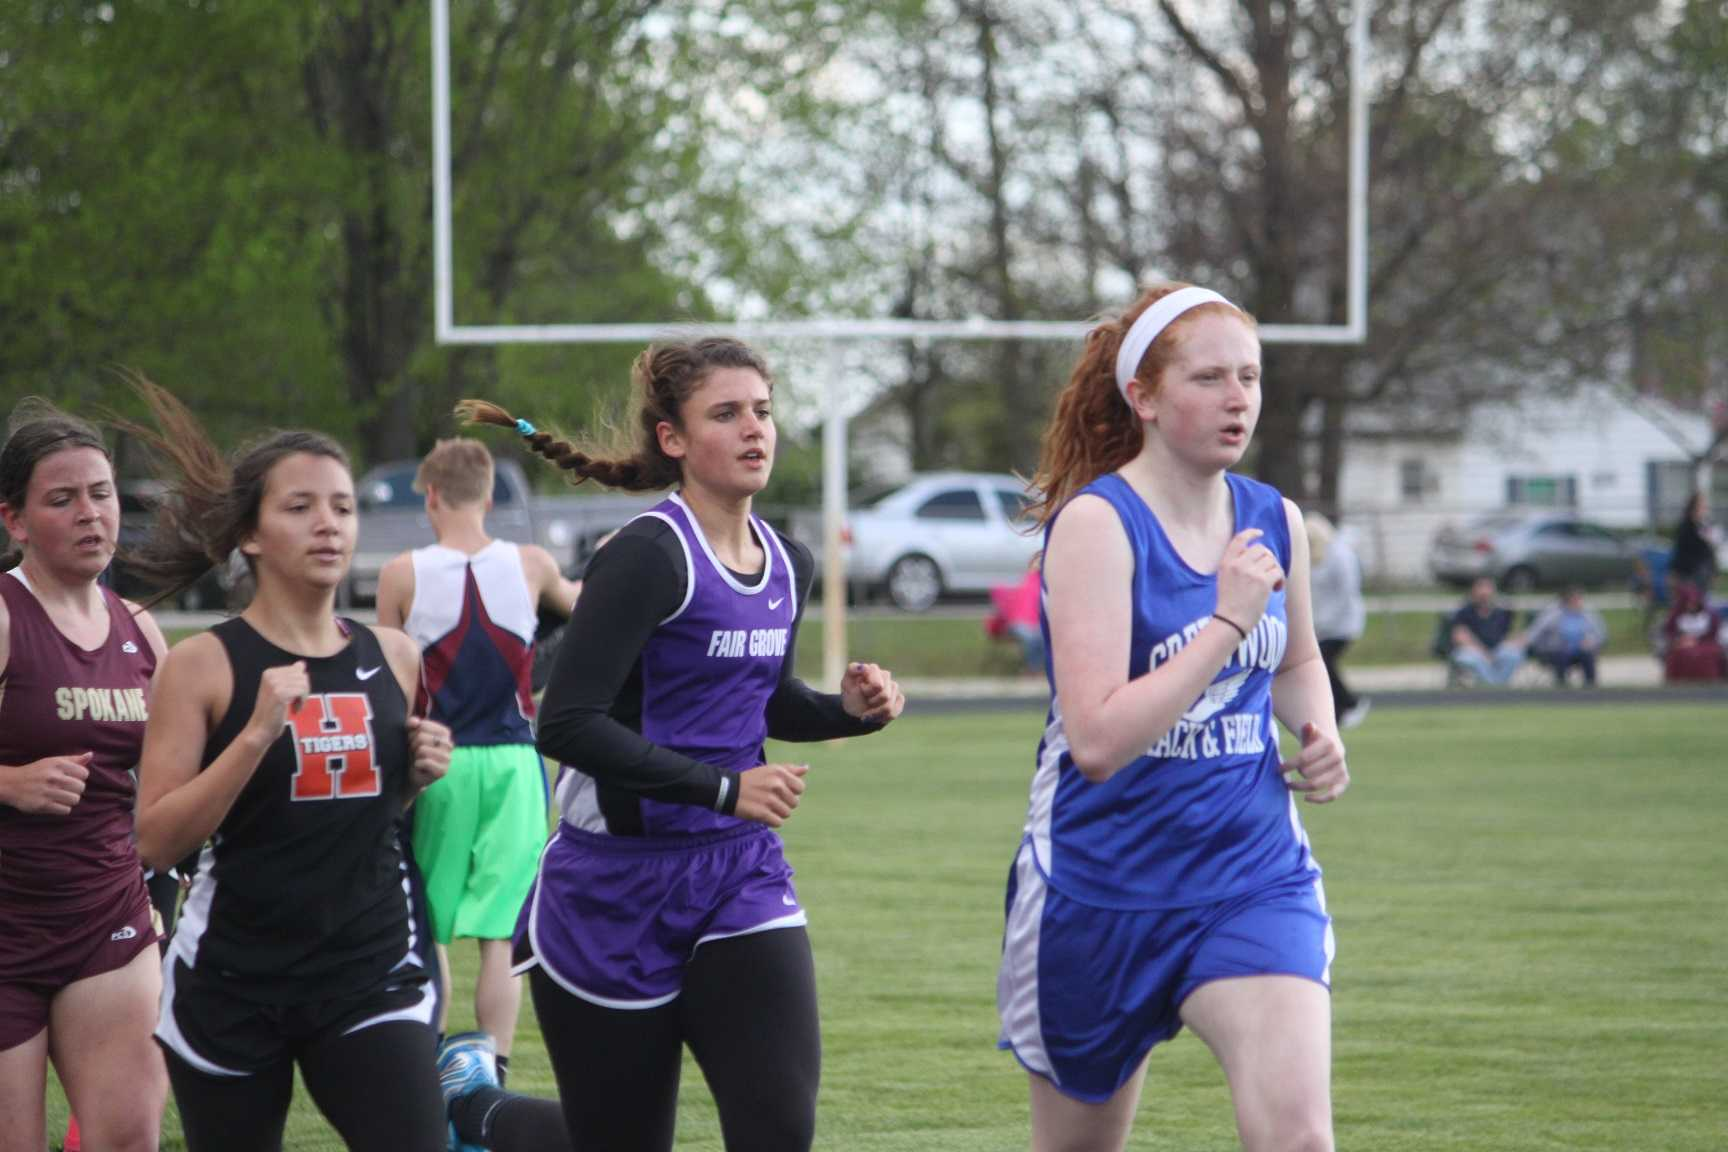 Kayla Bruemmer competes at Straford's track event